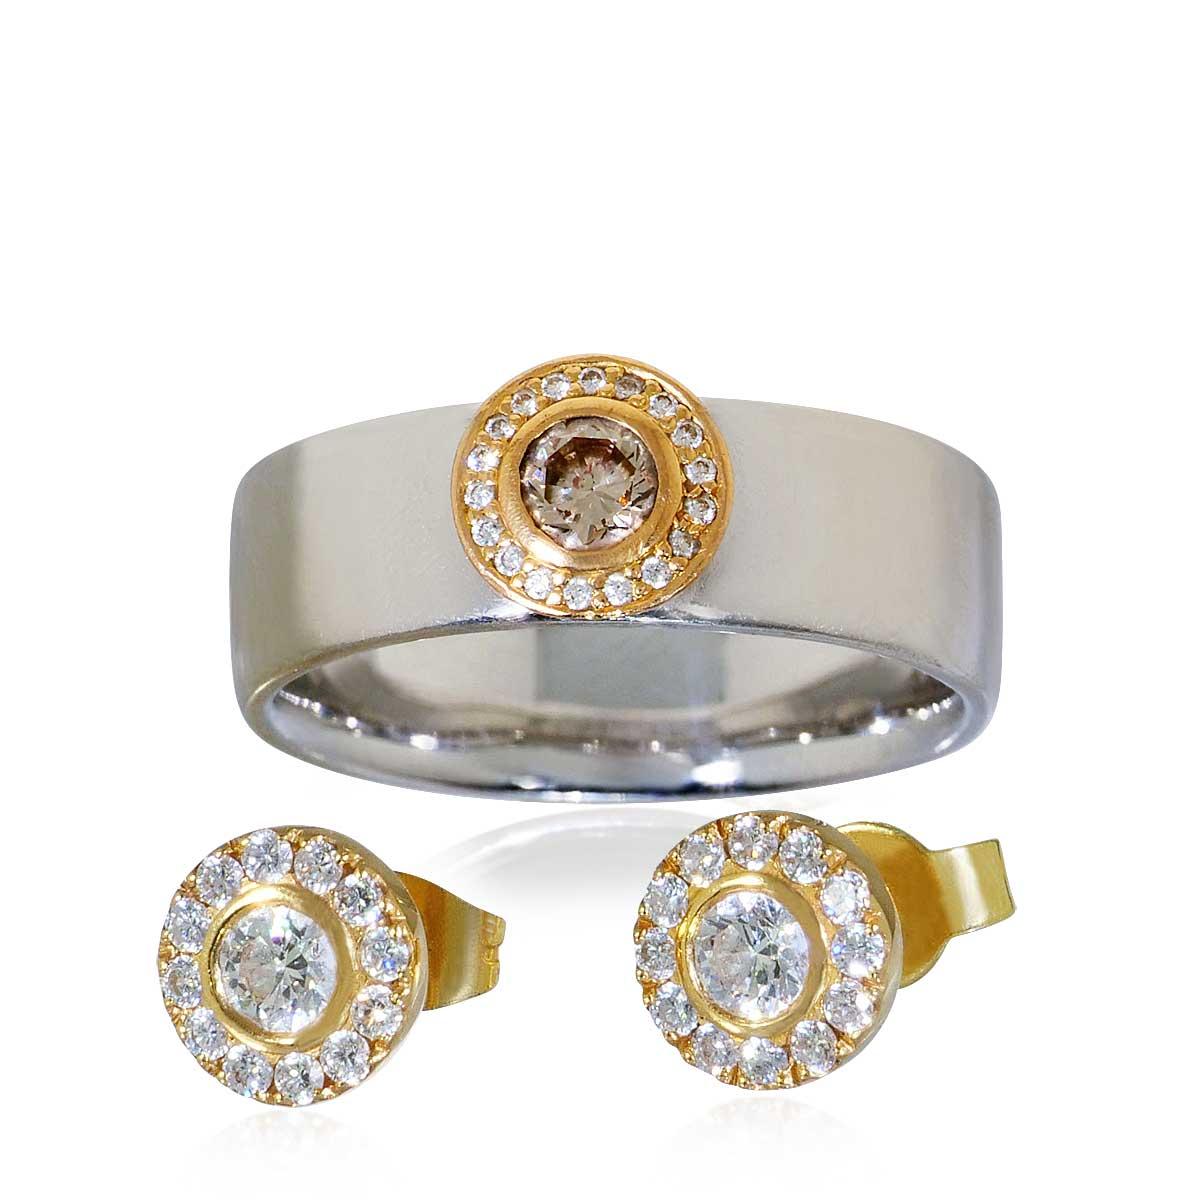 Antiker schmuck  Memento mori Ring, Antiker Memento mori Ring, Goldring mit ...